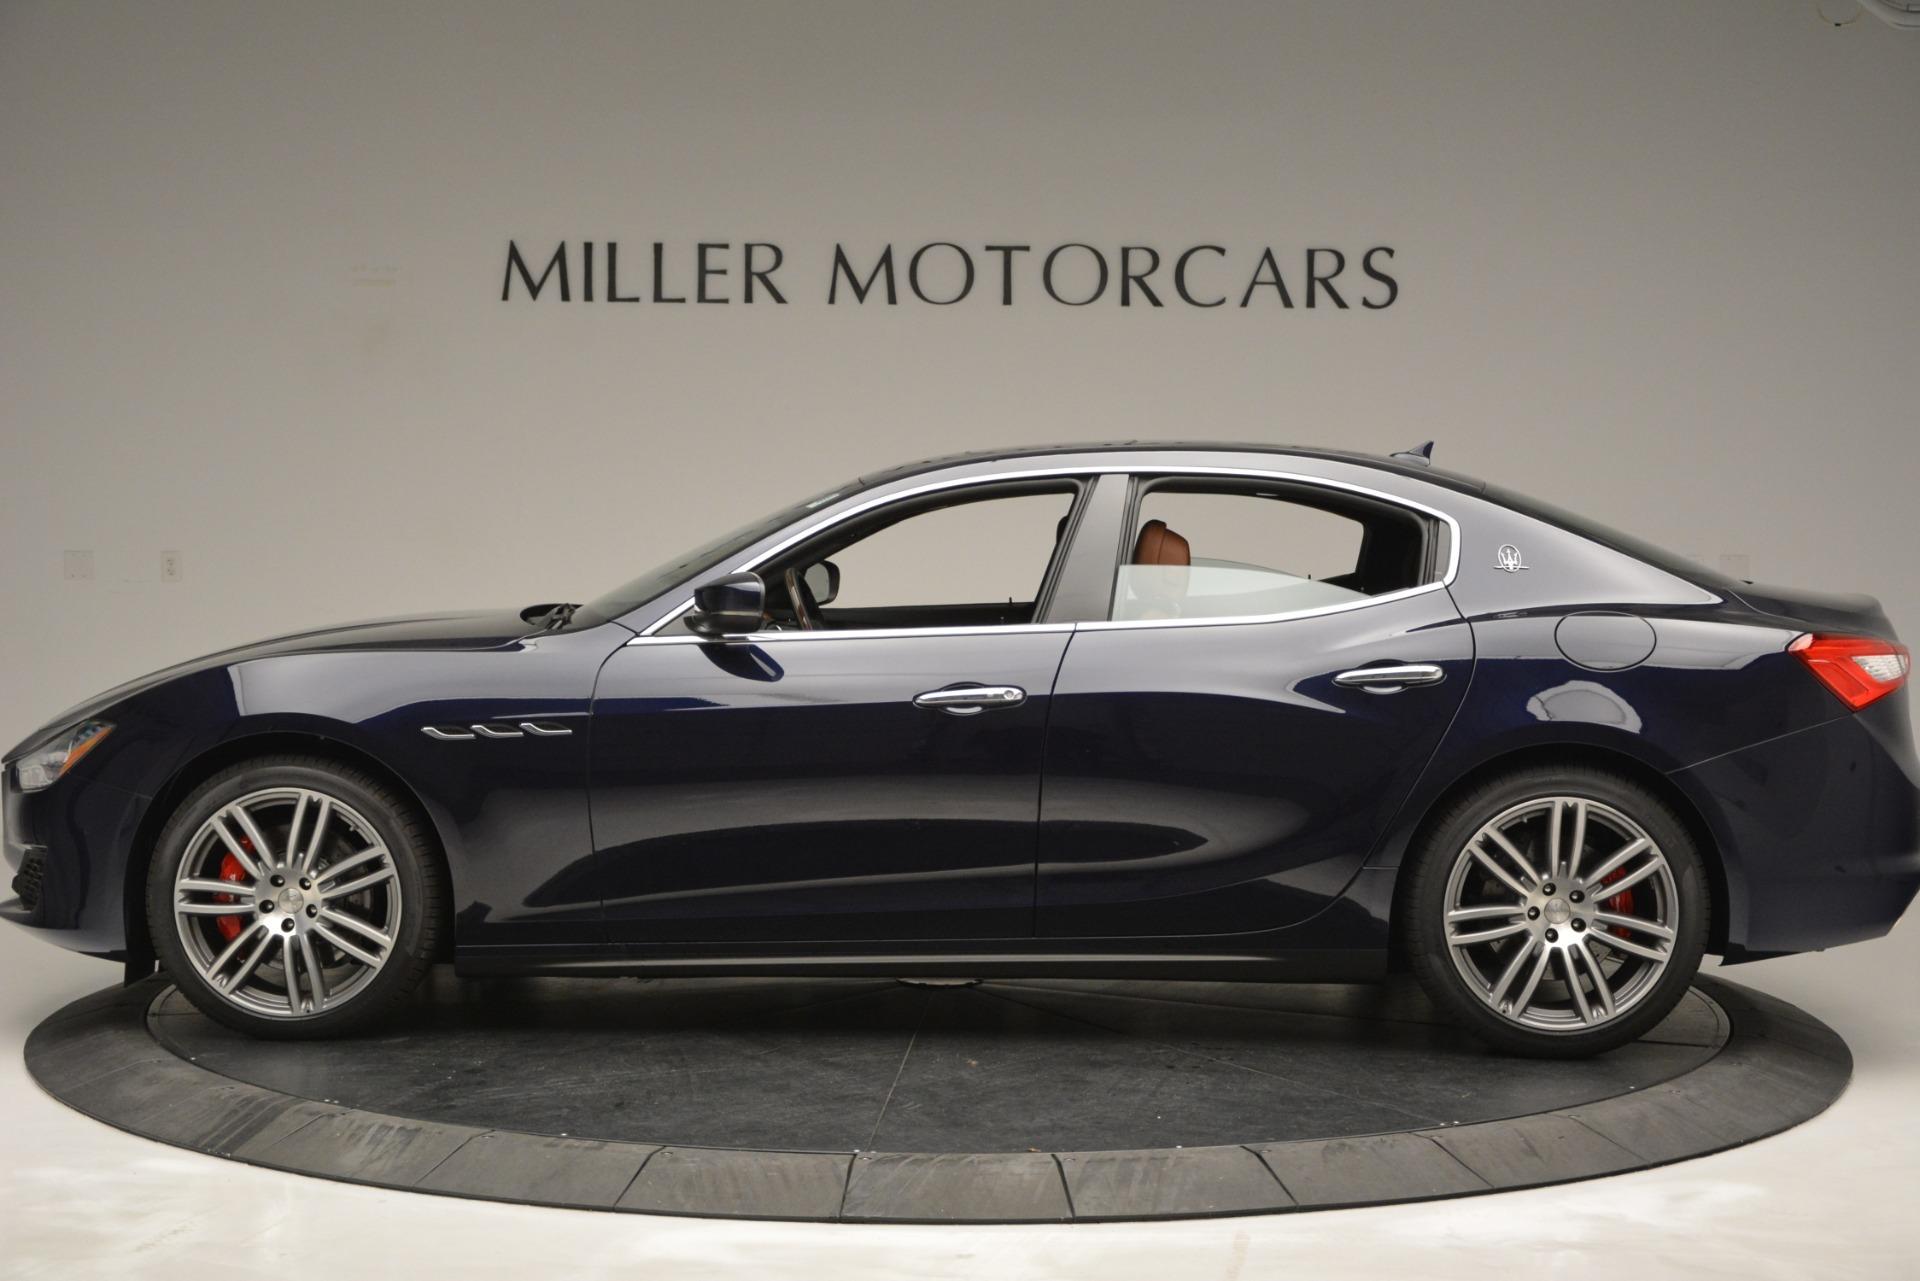 New 2019 Maserati Ghibli S Q4 For Sale In Westport, CT 2737_p3